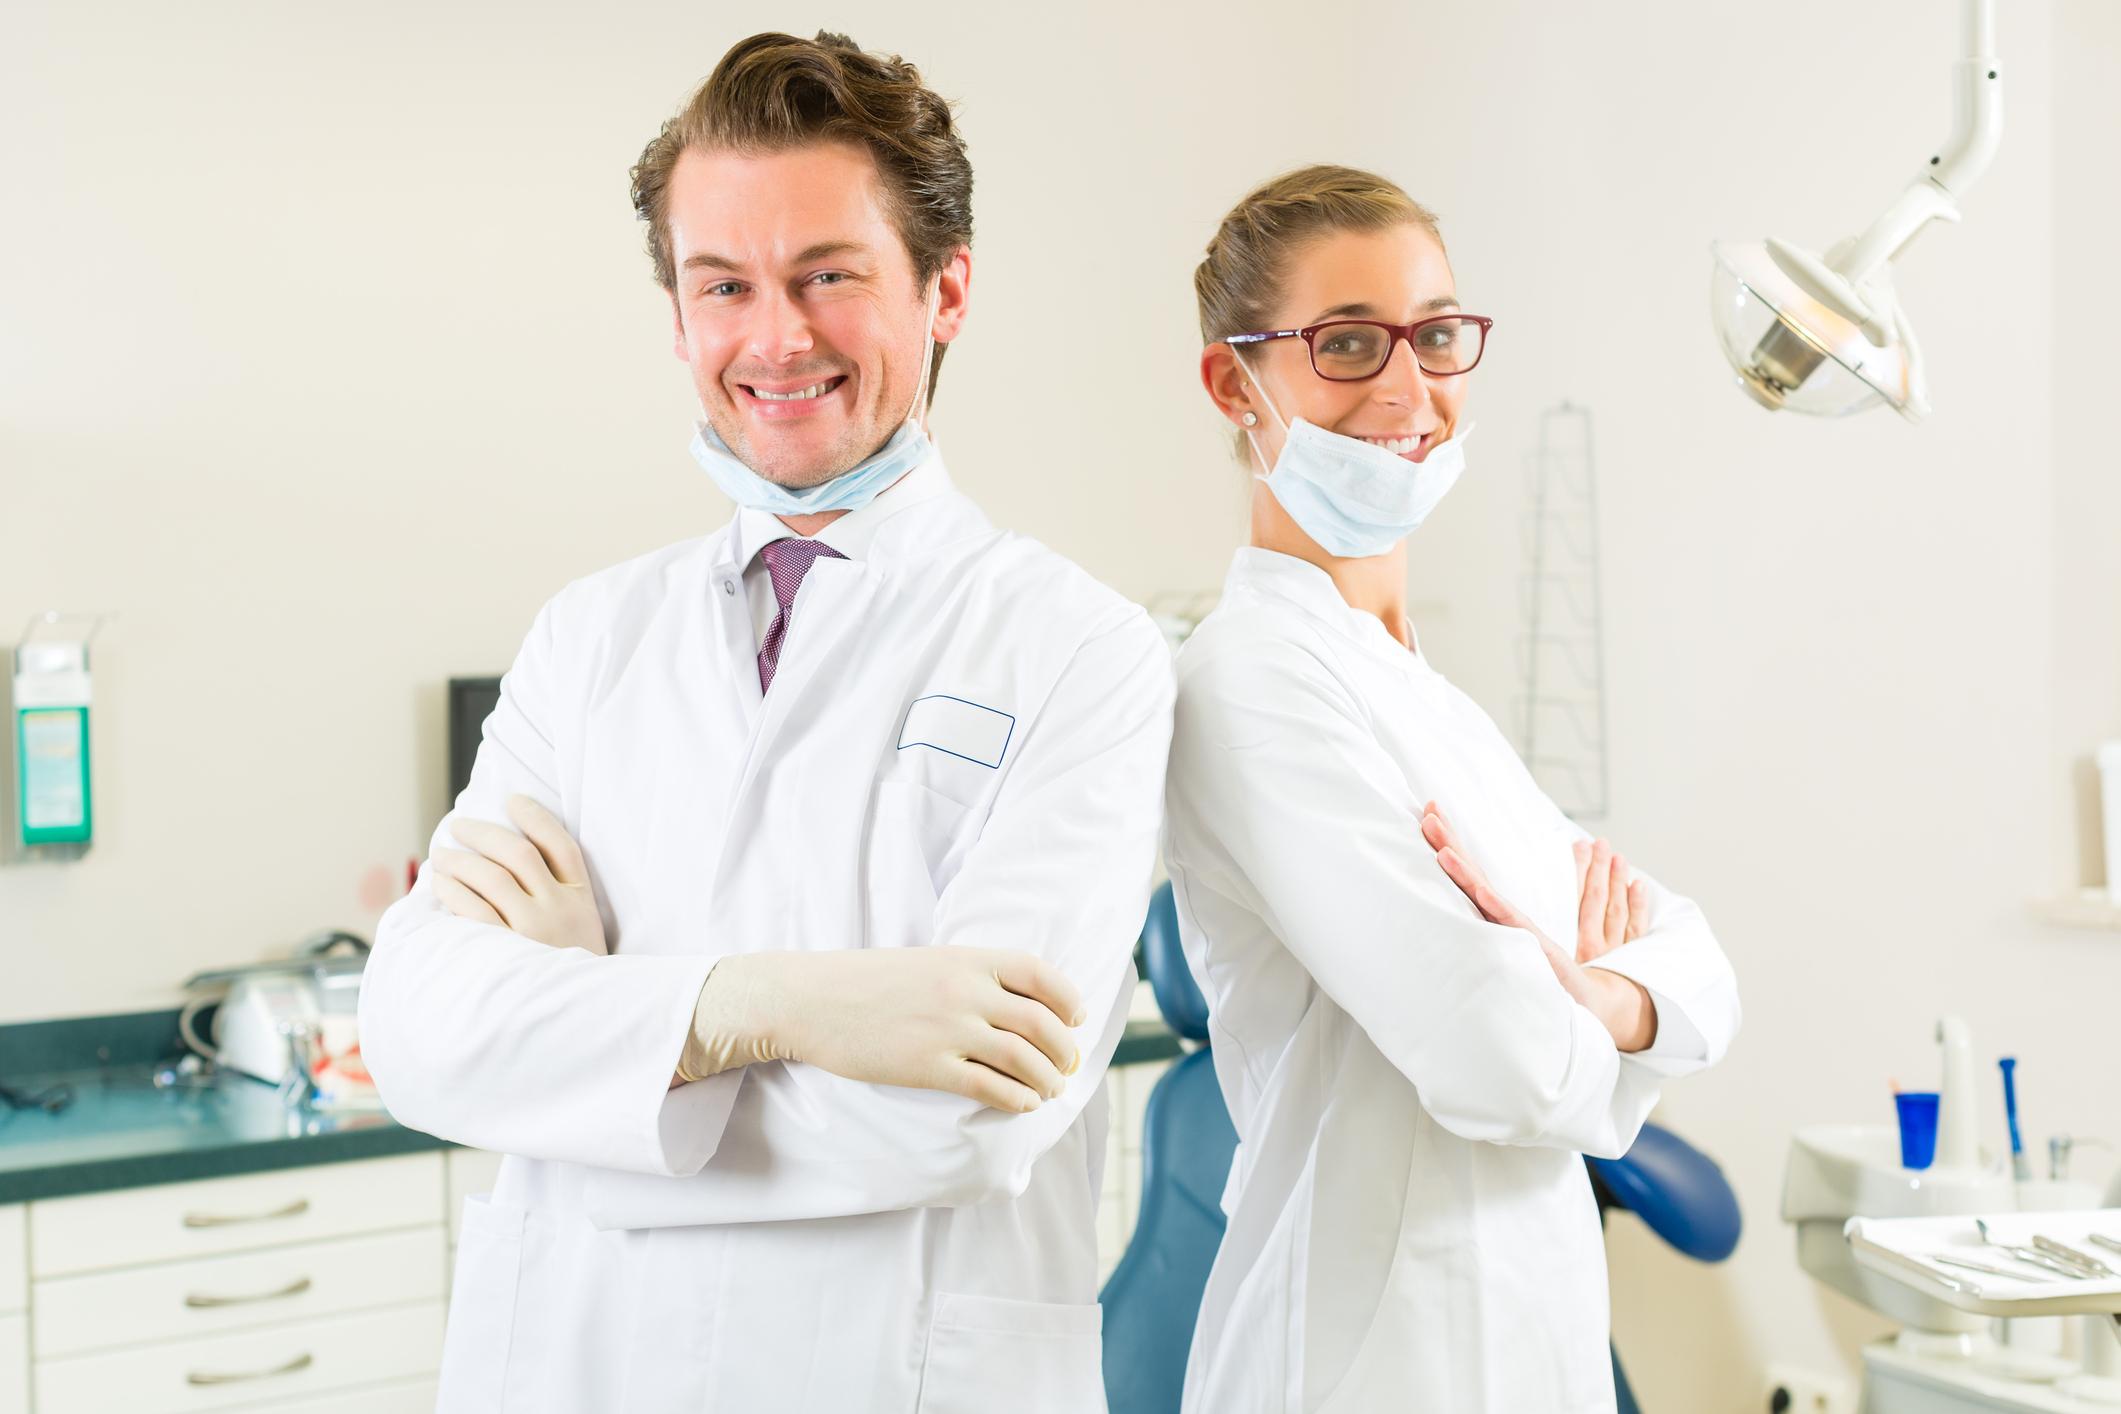 Dentist - Job Scorecard